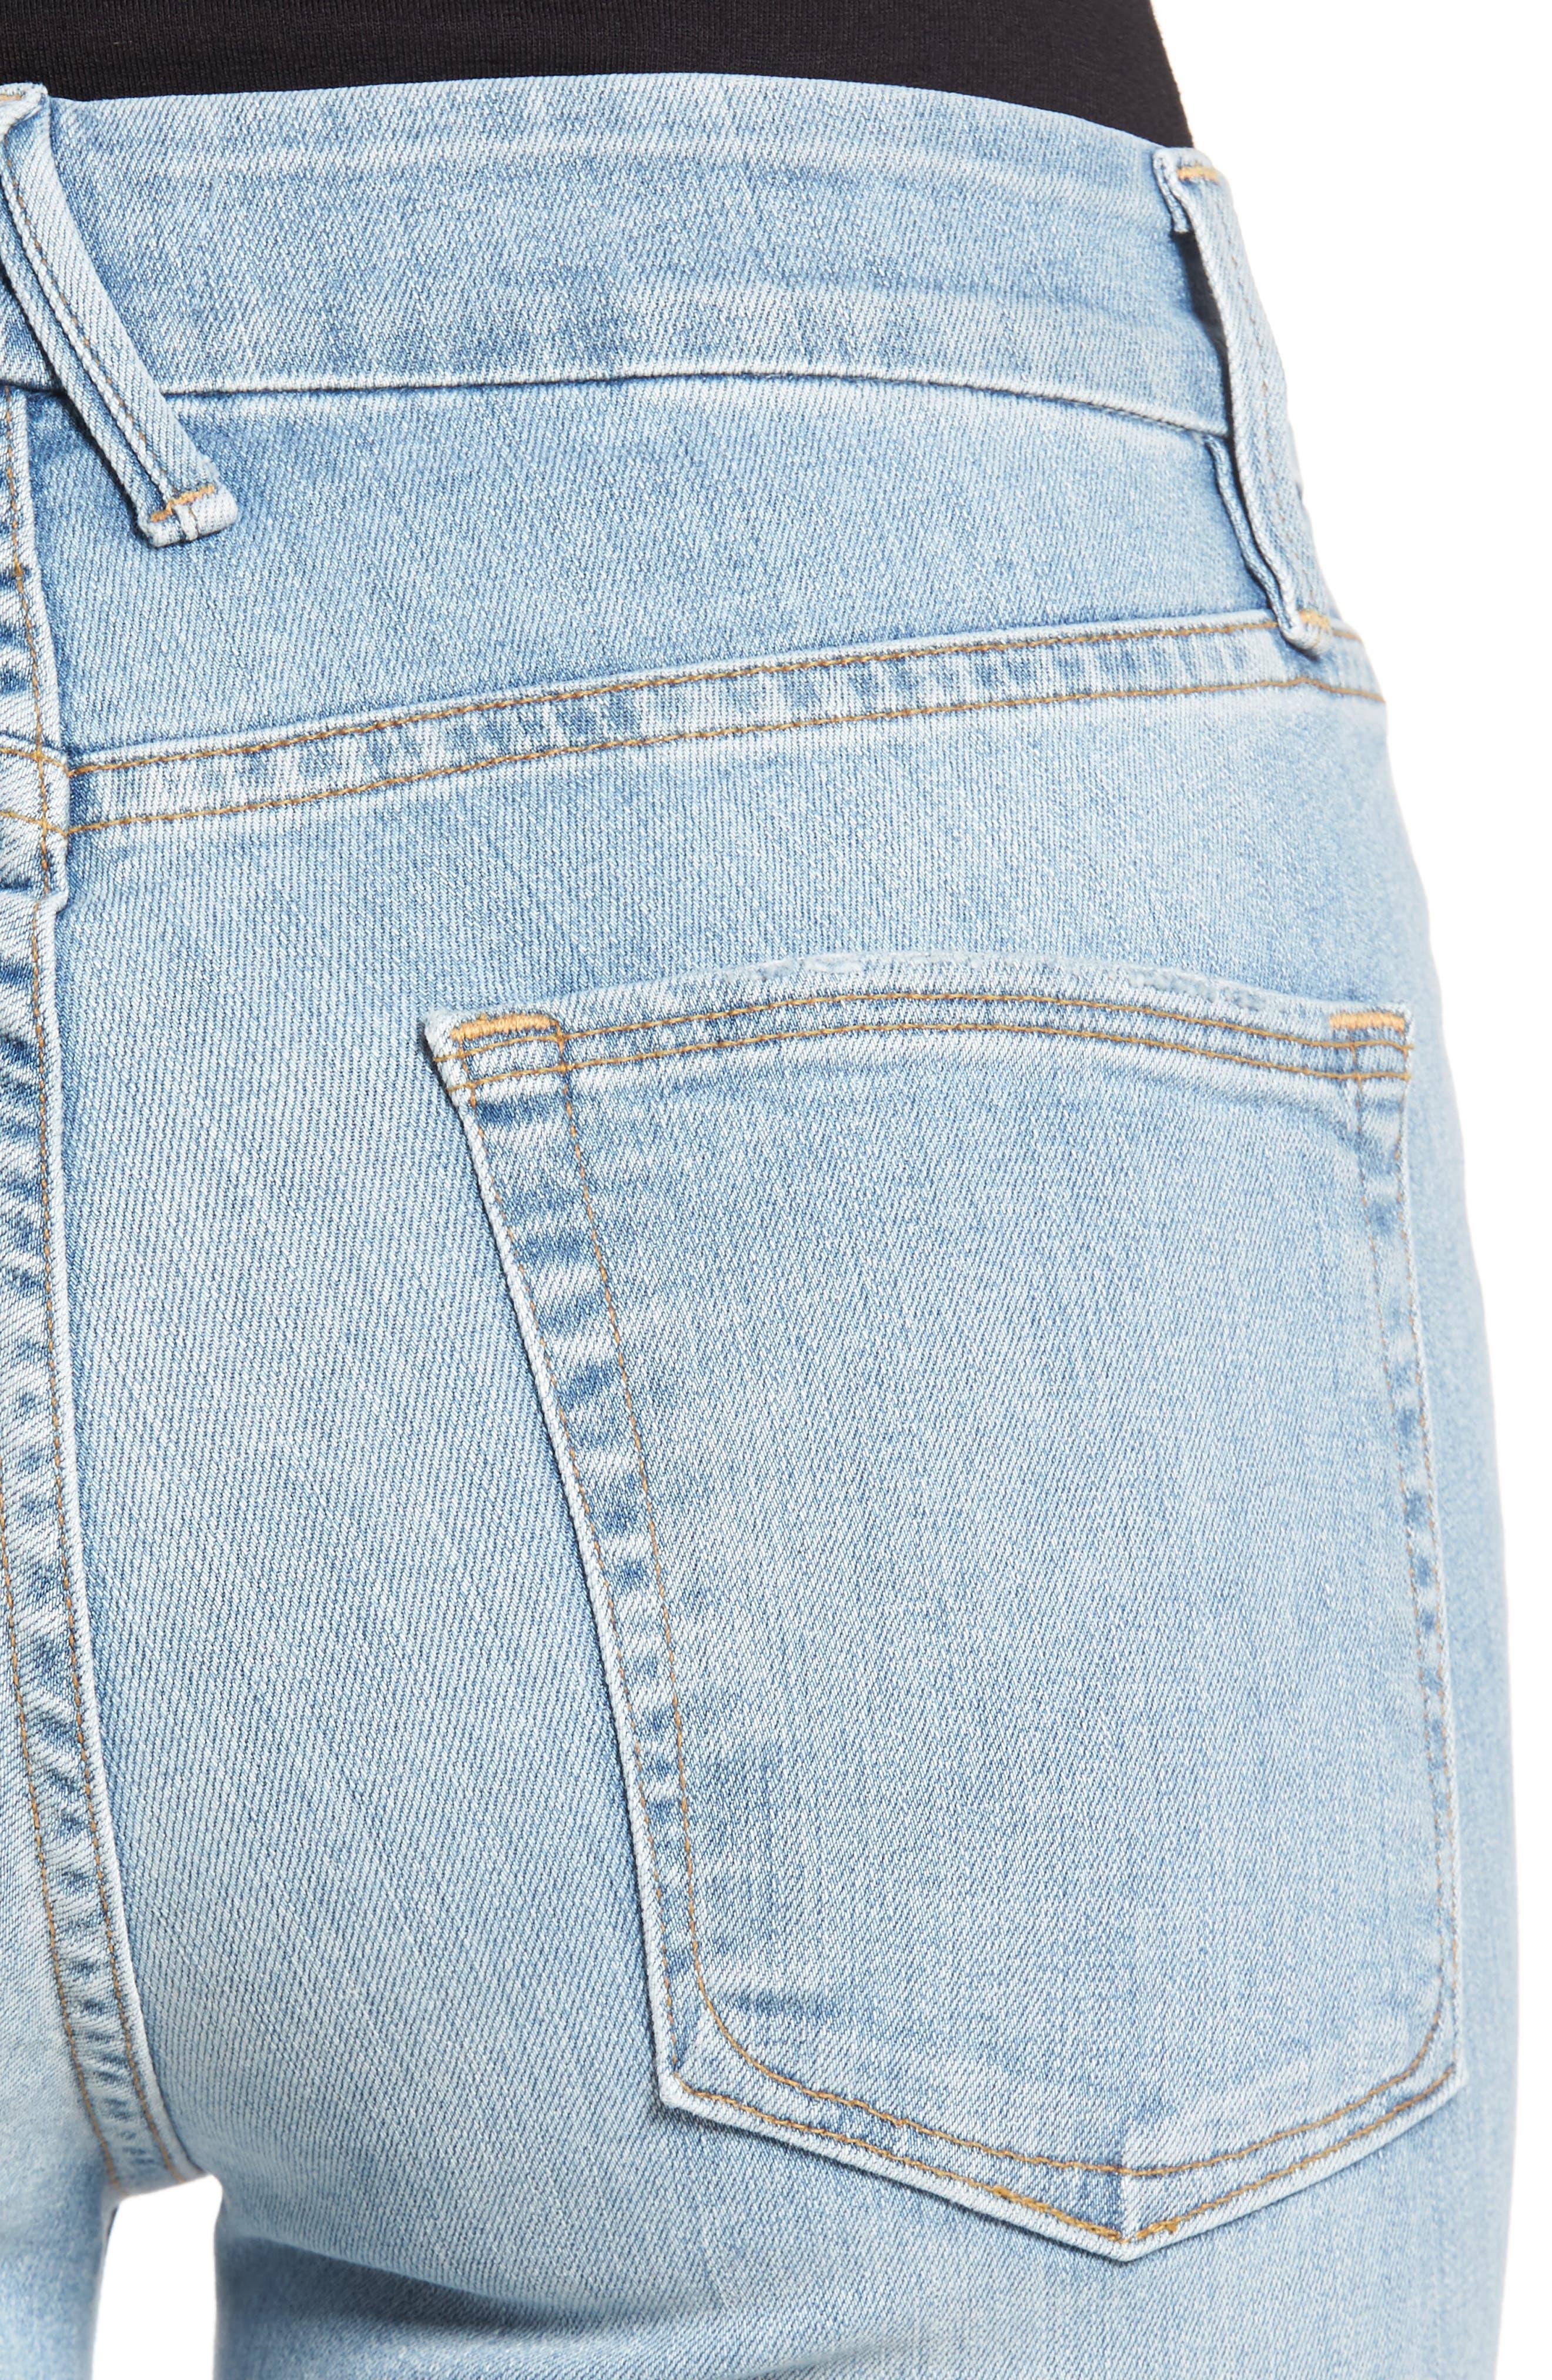 Crop Raw Edge Bootcut Jeans,                             Alternate thumbnail 4, color,                             402